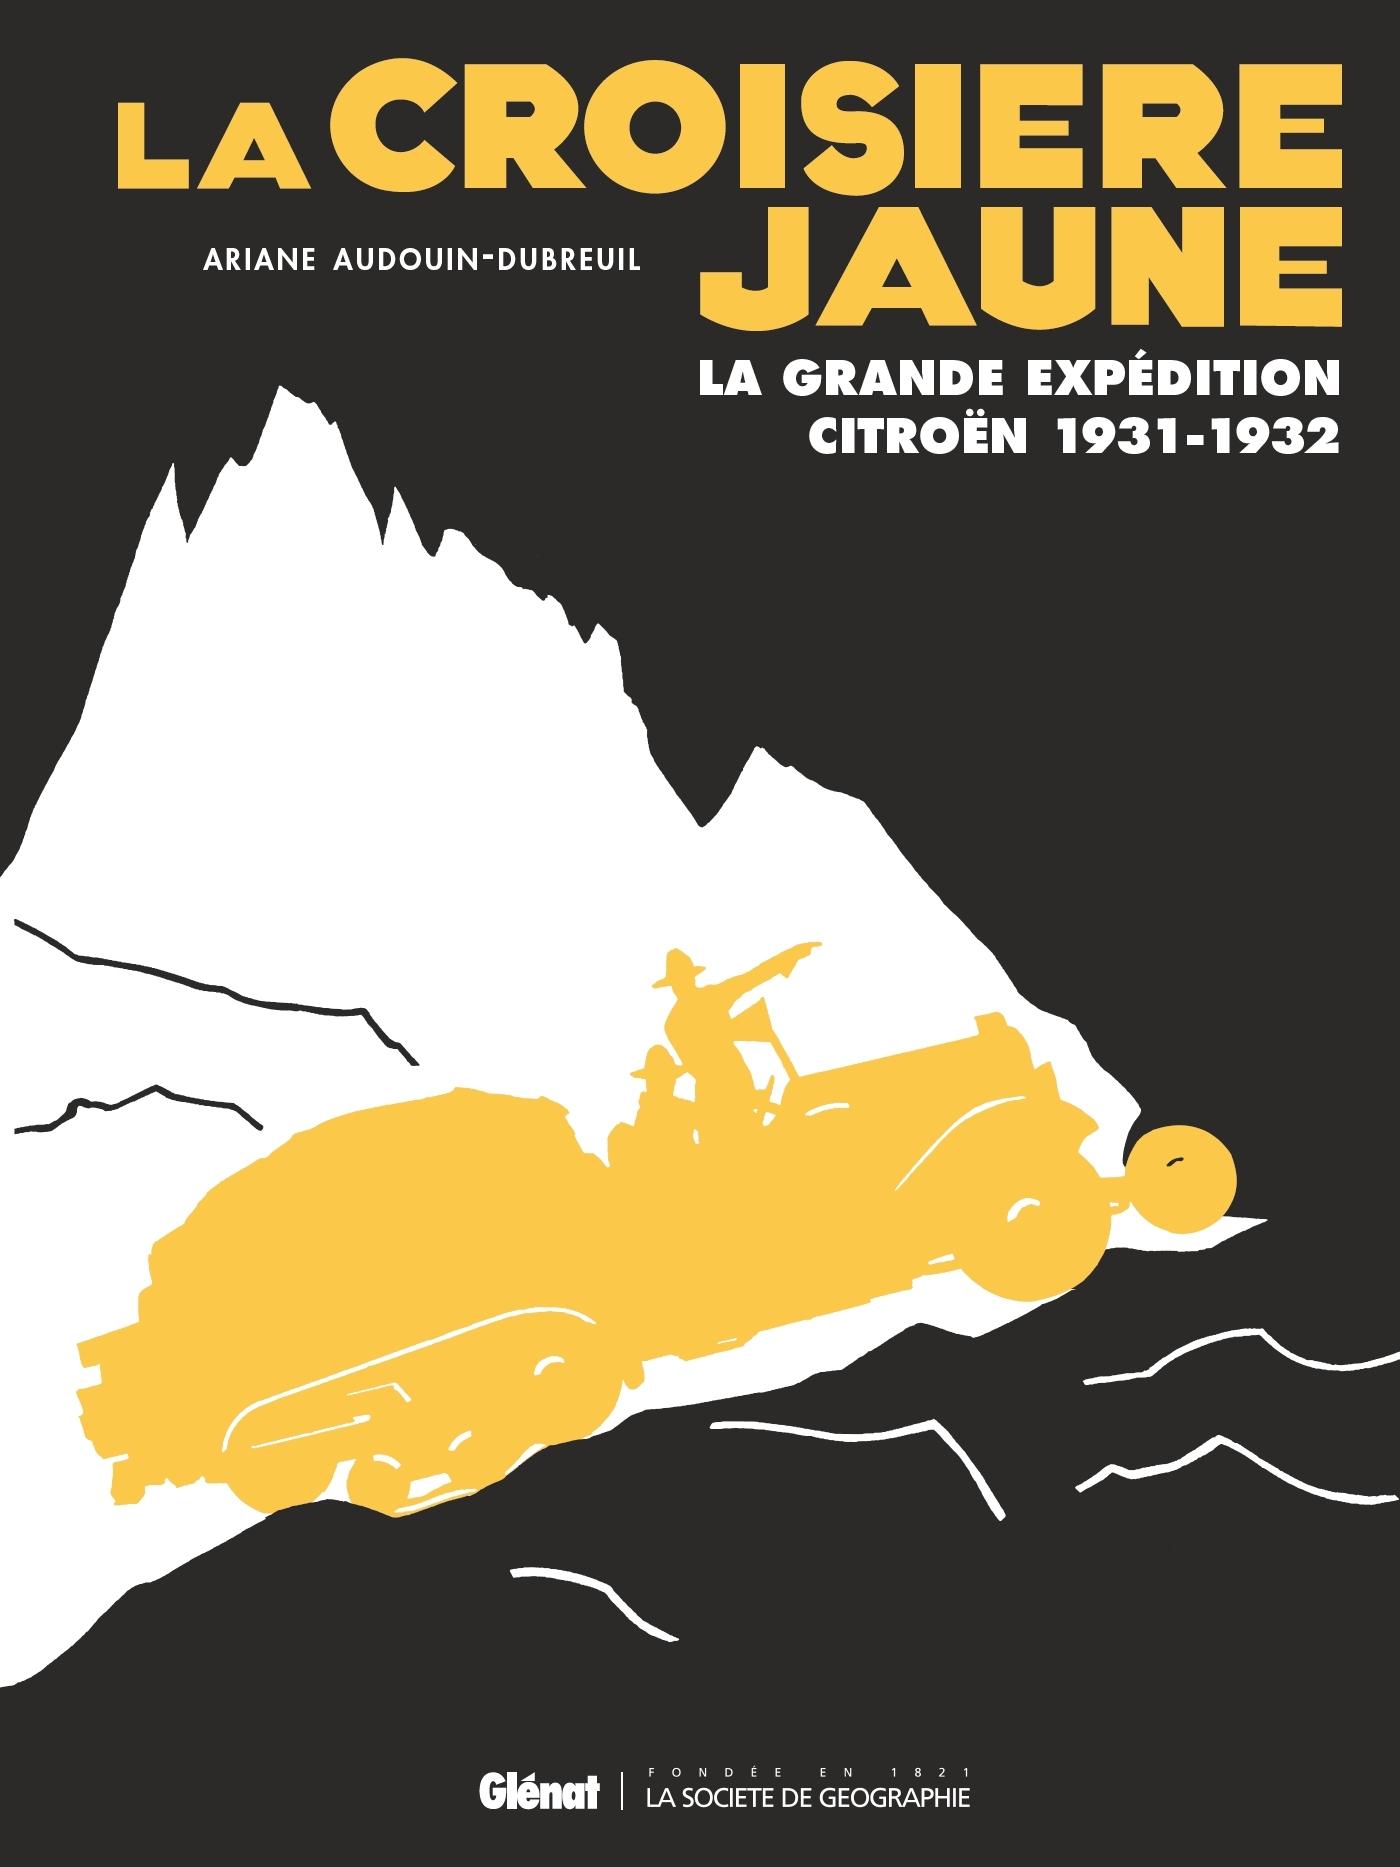 LA CROISIERE JAUNE - LA GRANDE EXPEDITION CITROEN 1931-1932 (EDITION SPECIALE 100 ANS CITROEN)